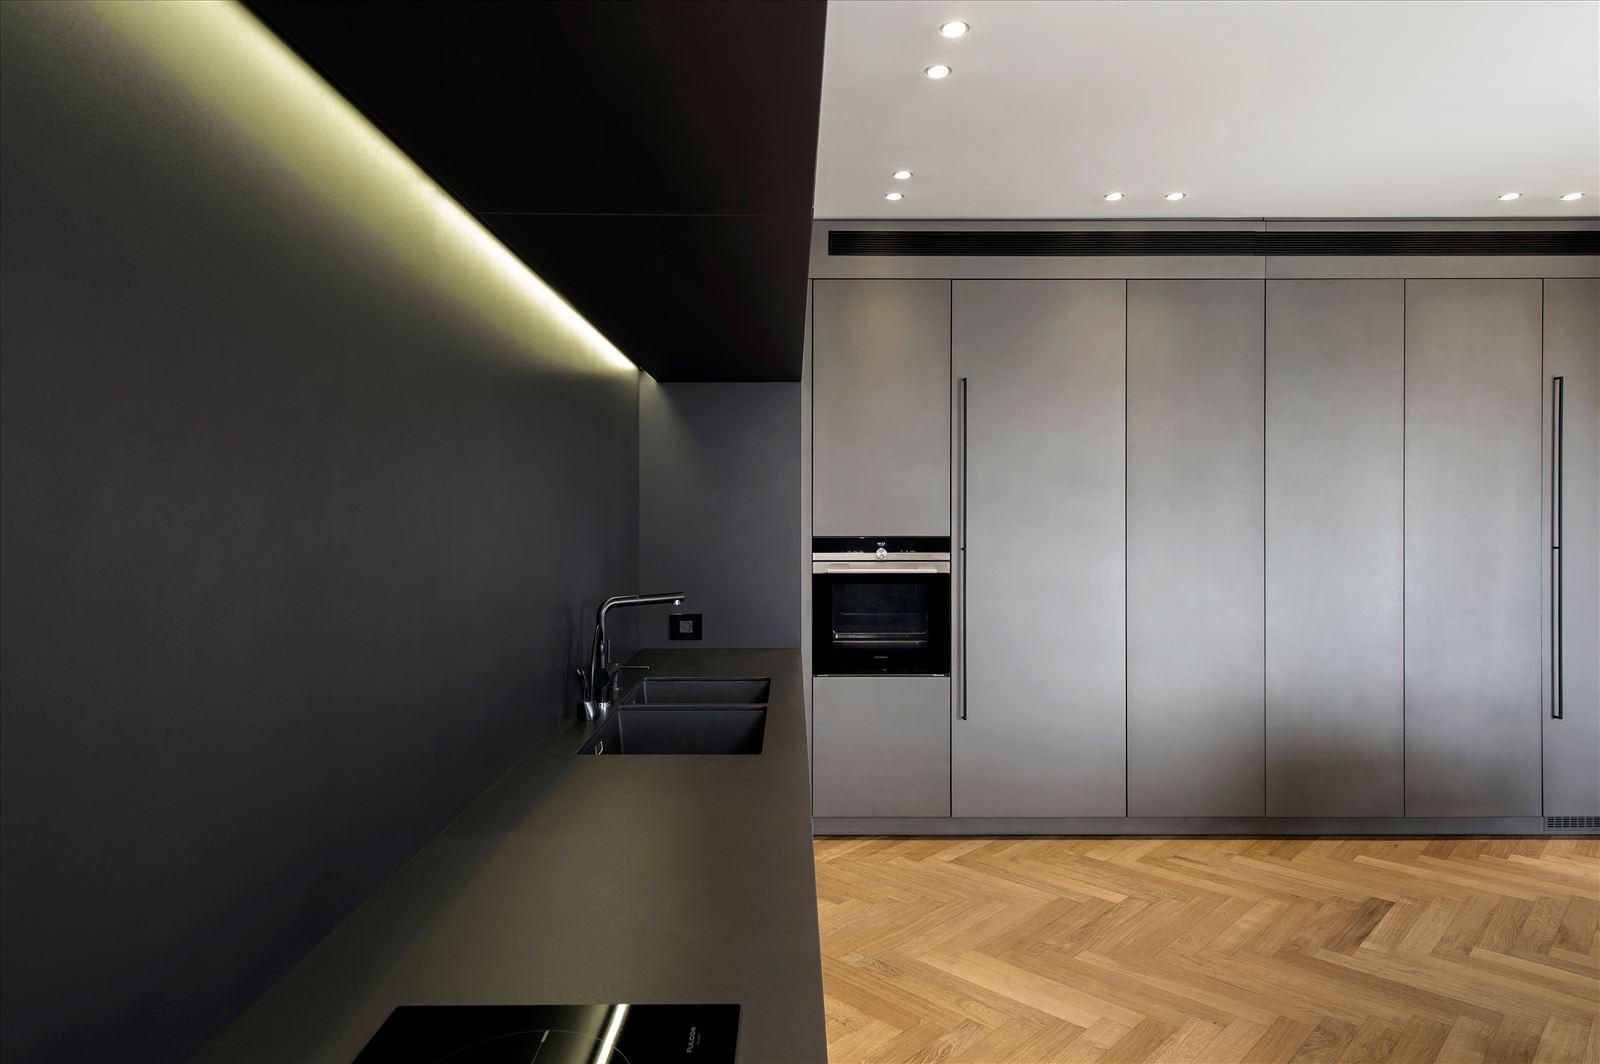 Penthouse - Petah Tikva משטח המטבח מואר בגוף תאורה מיוחד הנעשה על ידי דורי קמחי